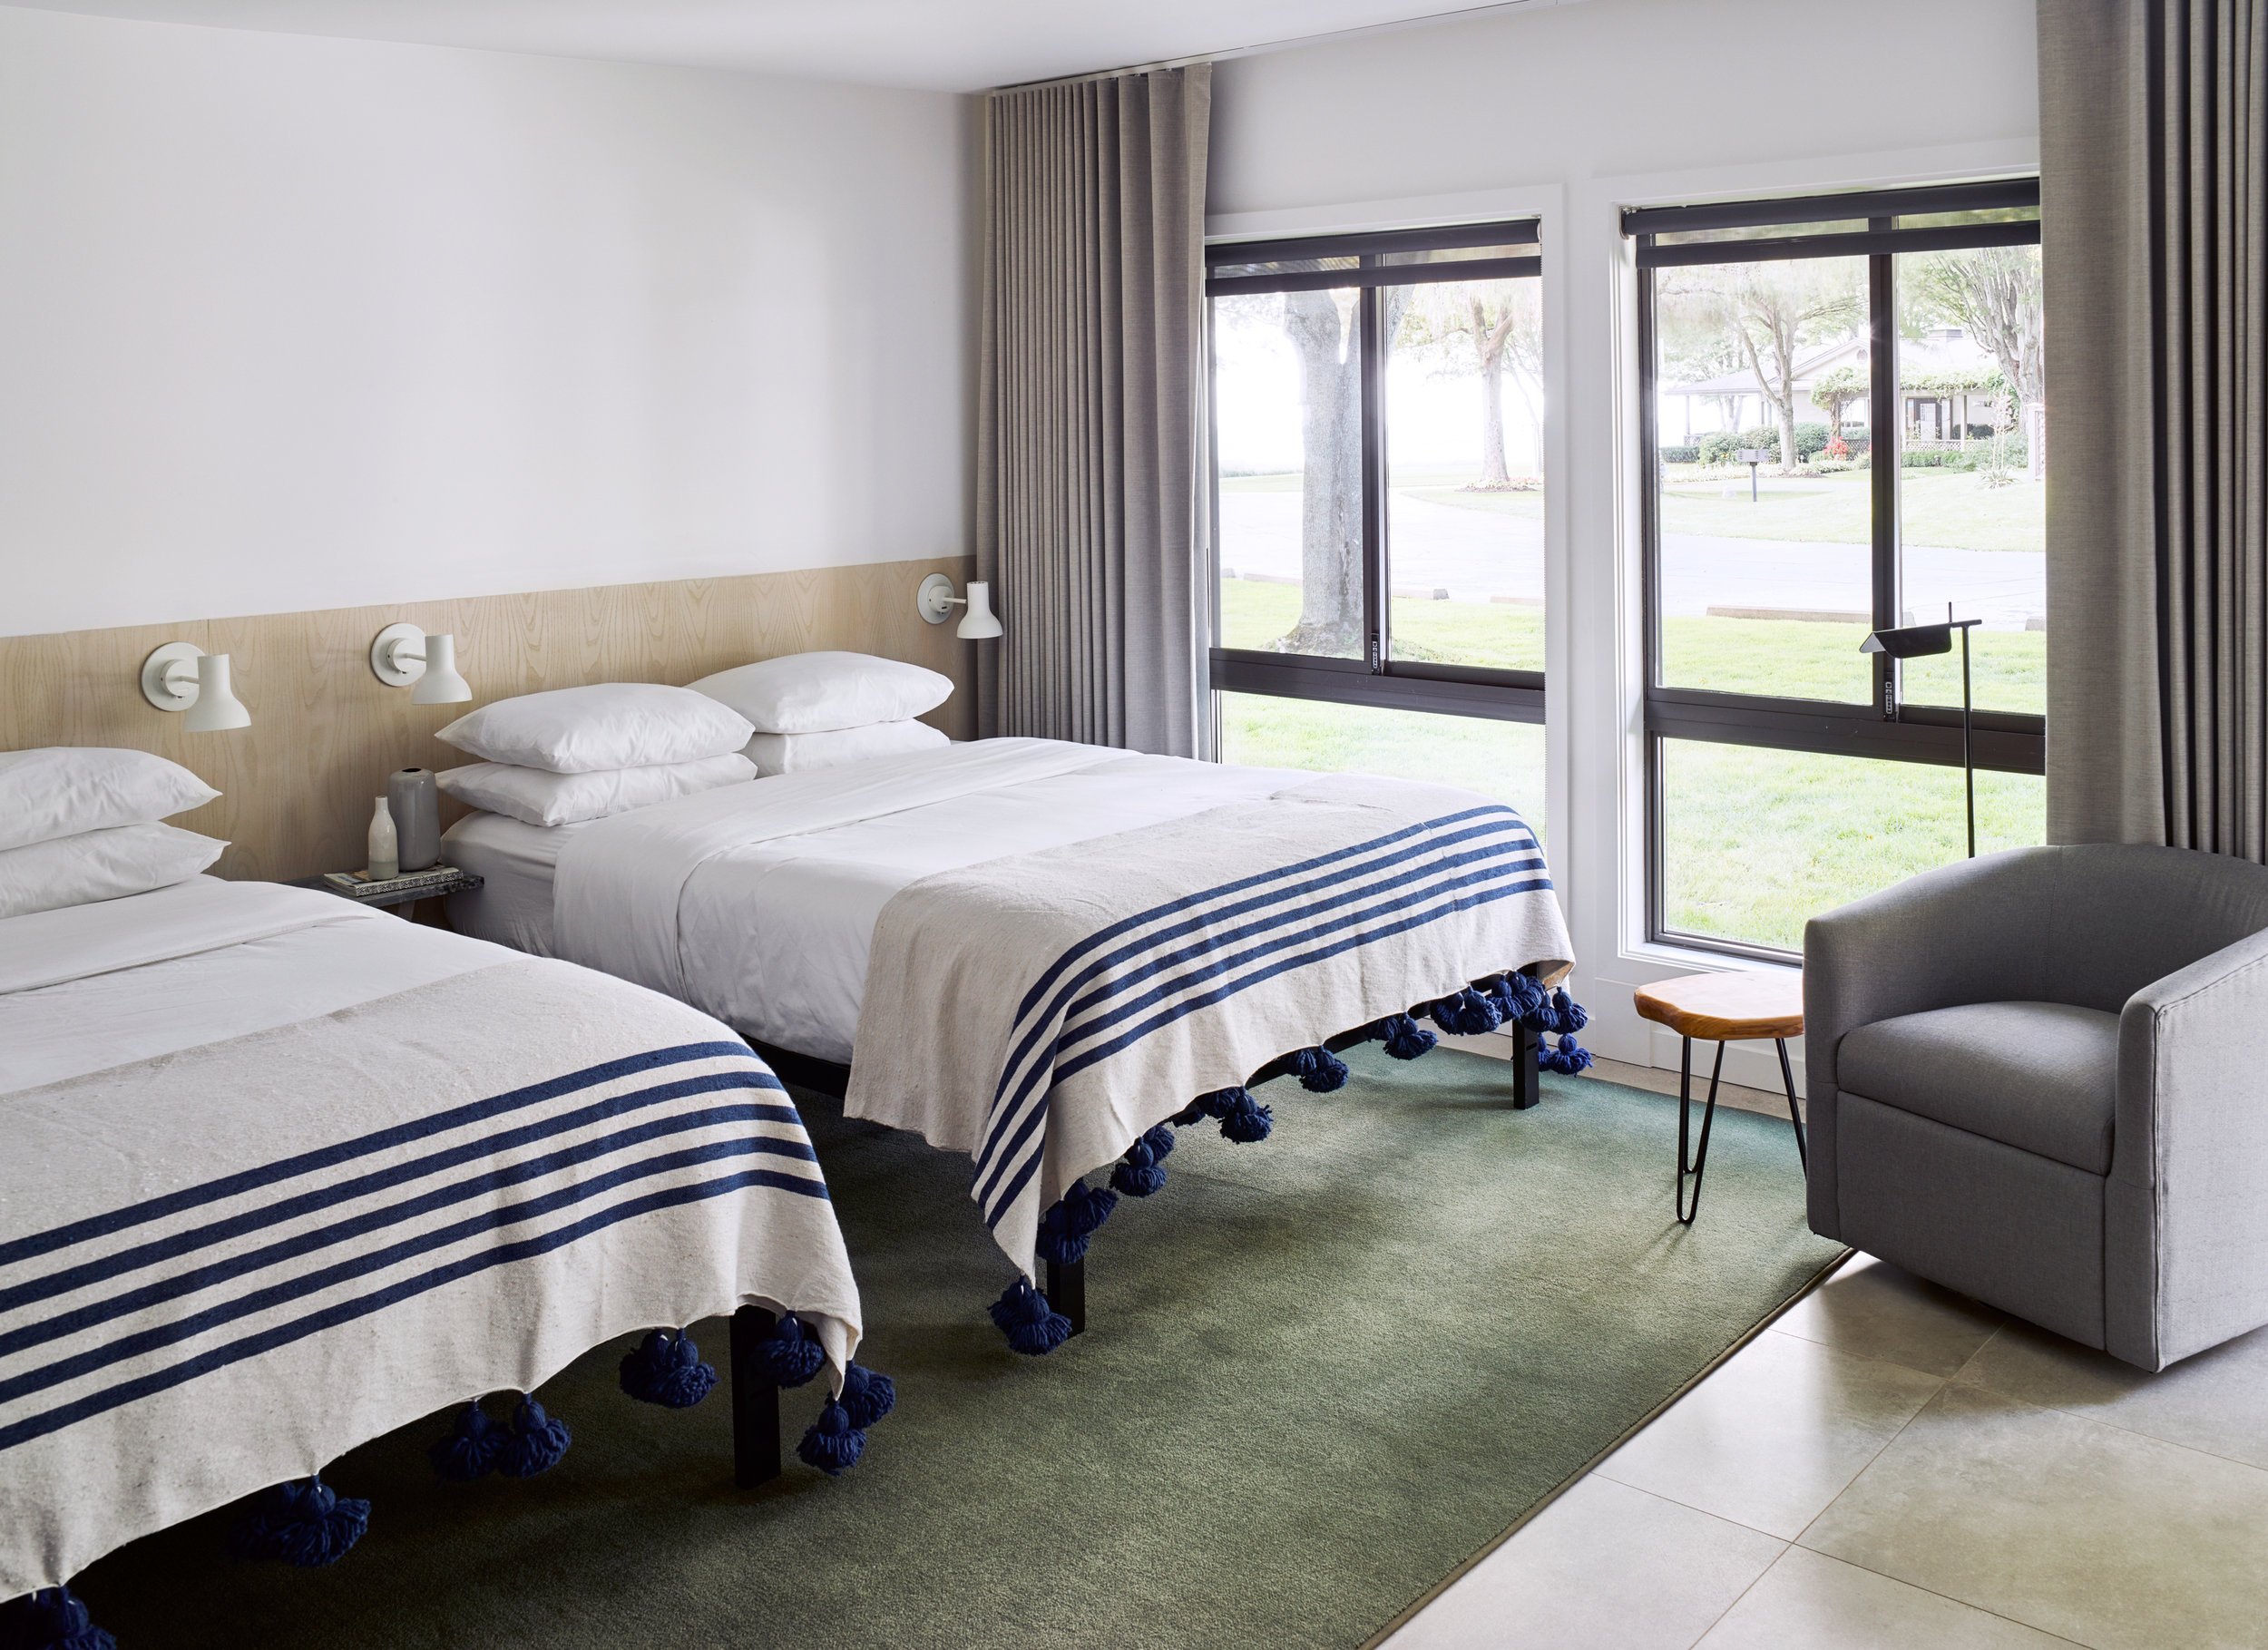 517-LVR_Room20Bed_68758-03-03.jpg